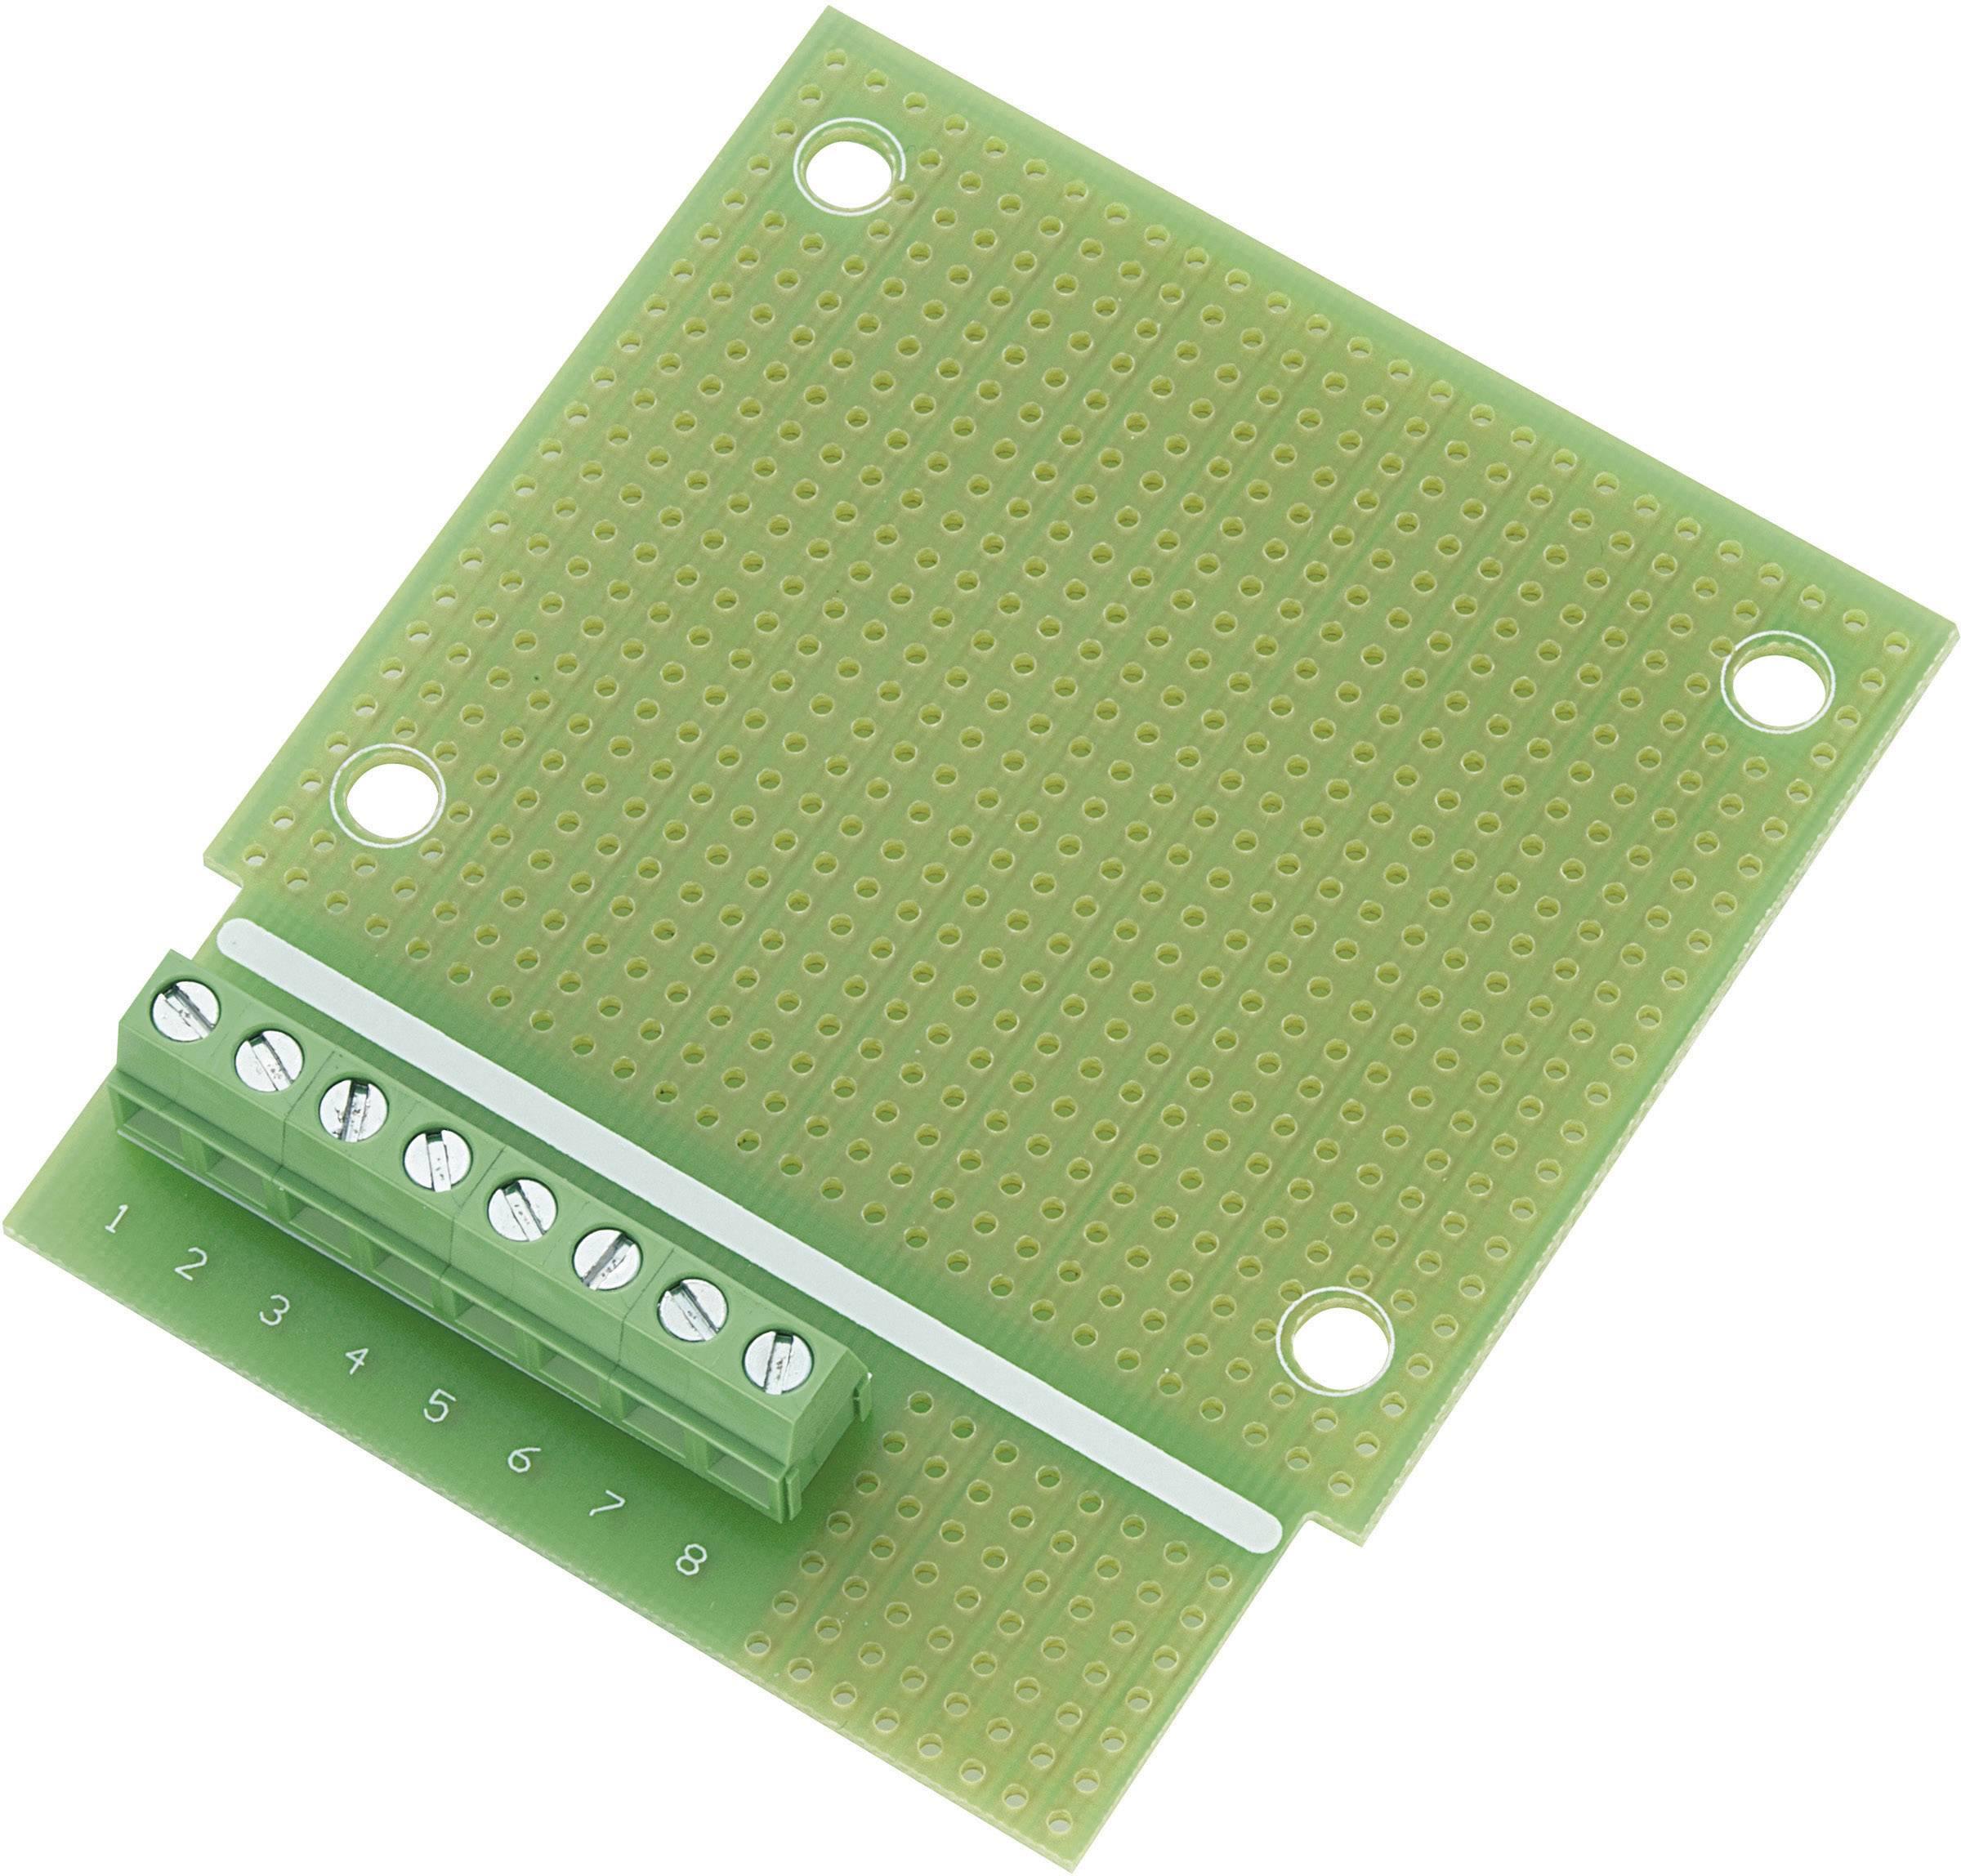 Deska DPS SU529029 (d x š) 82,9 mm x 64,9 mm